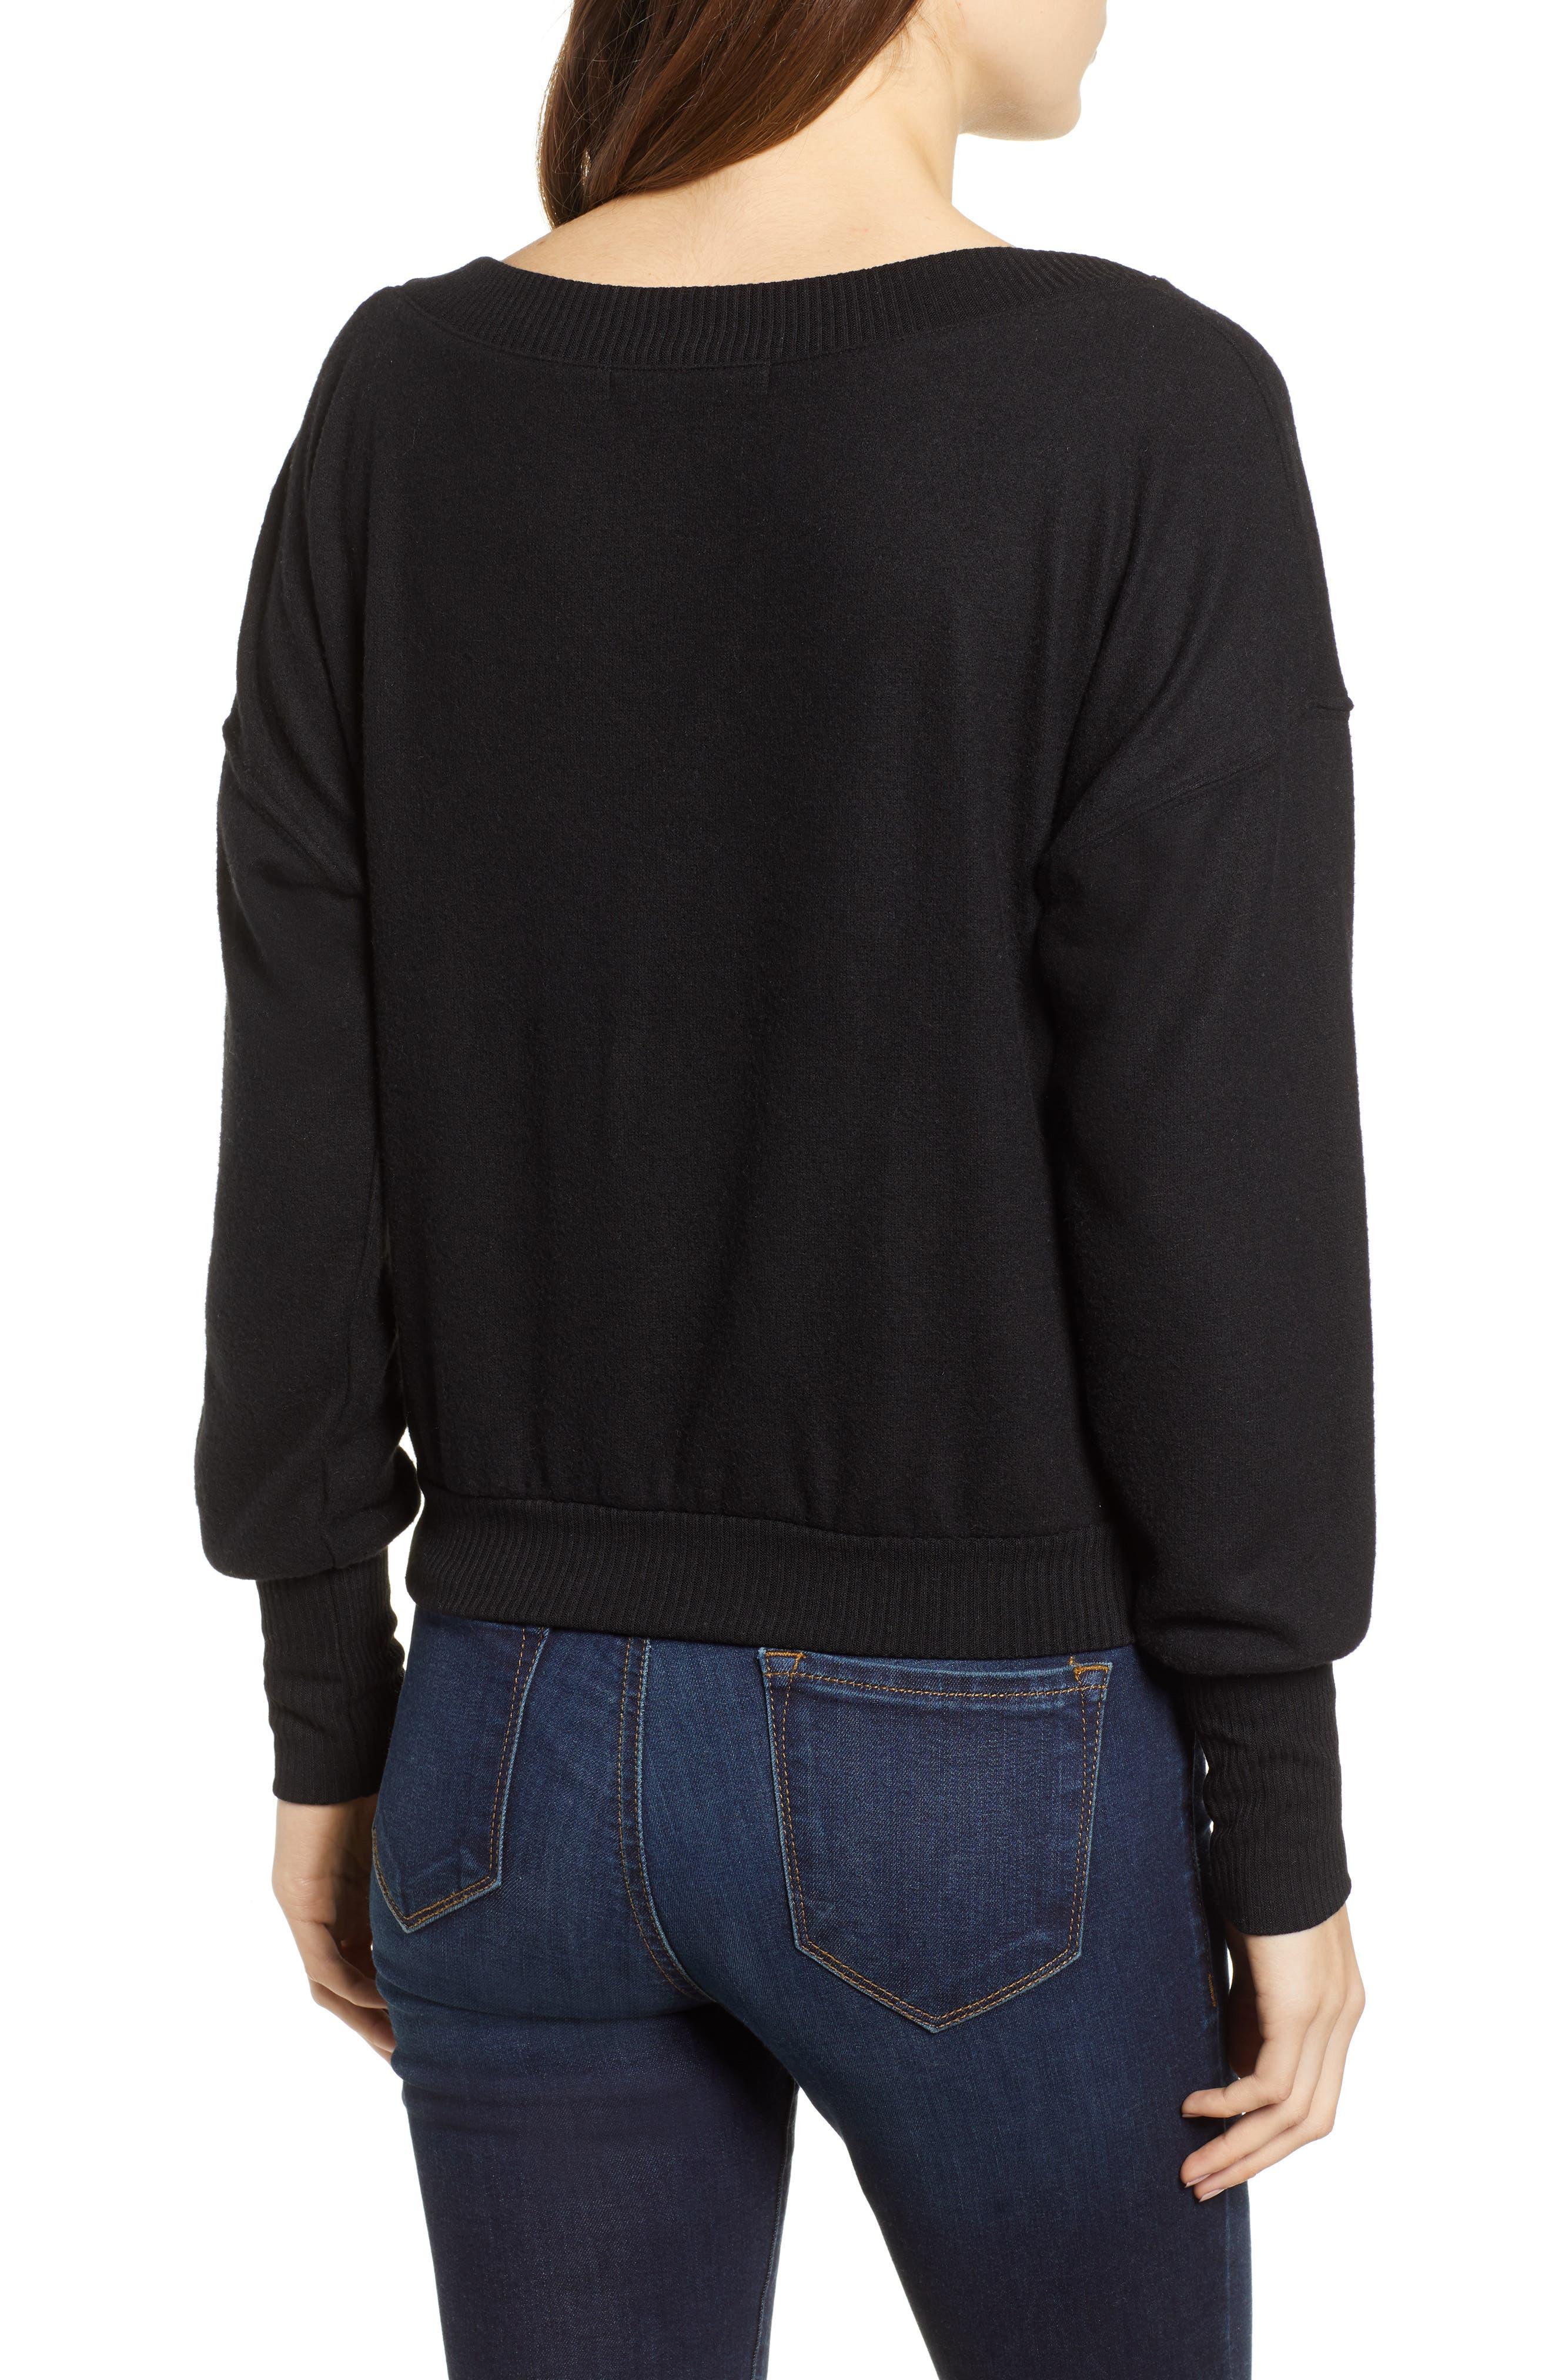 Darwin Cozy Sweatshirt,                             Alternate thumbnail 2, color,                             BLACK